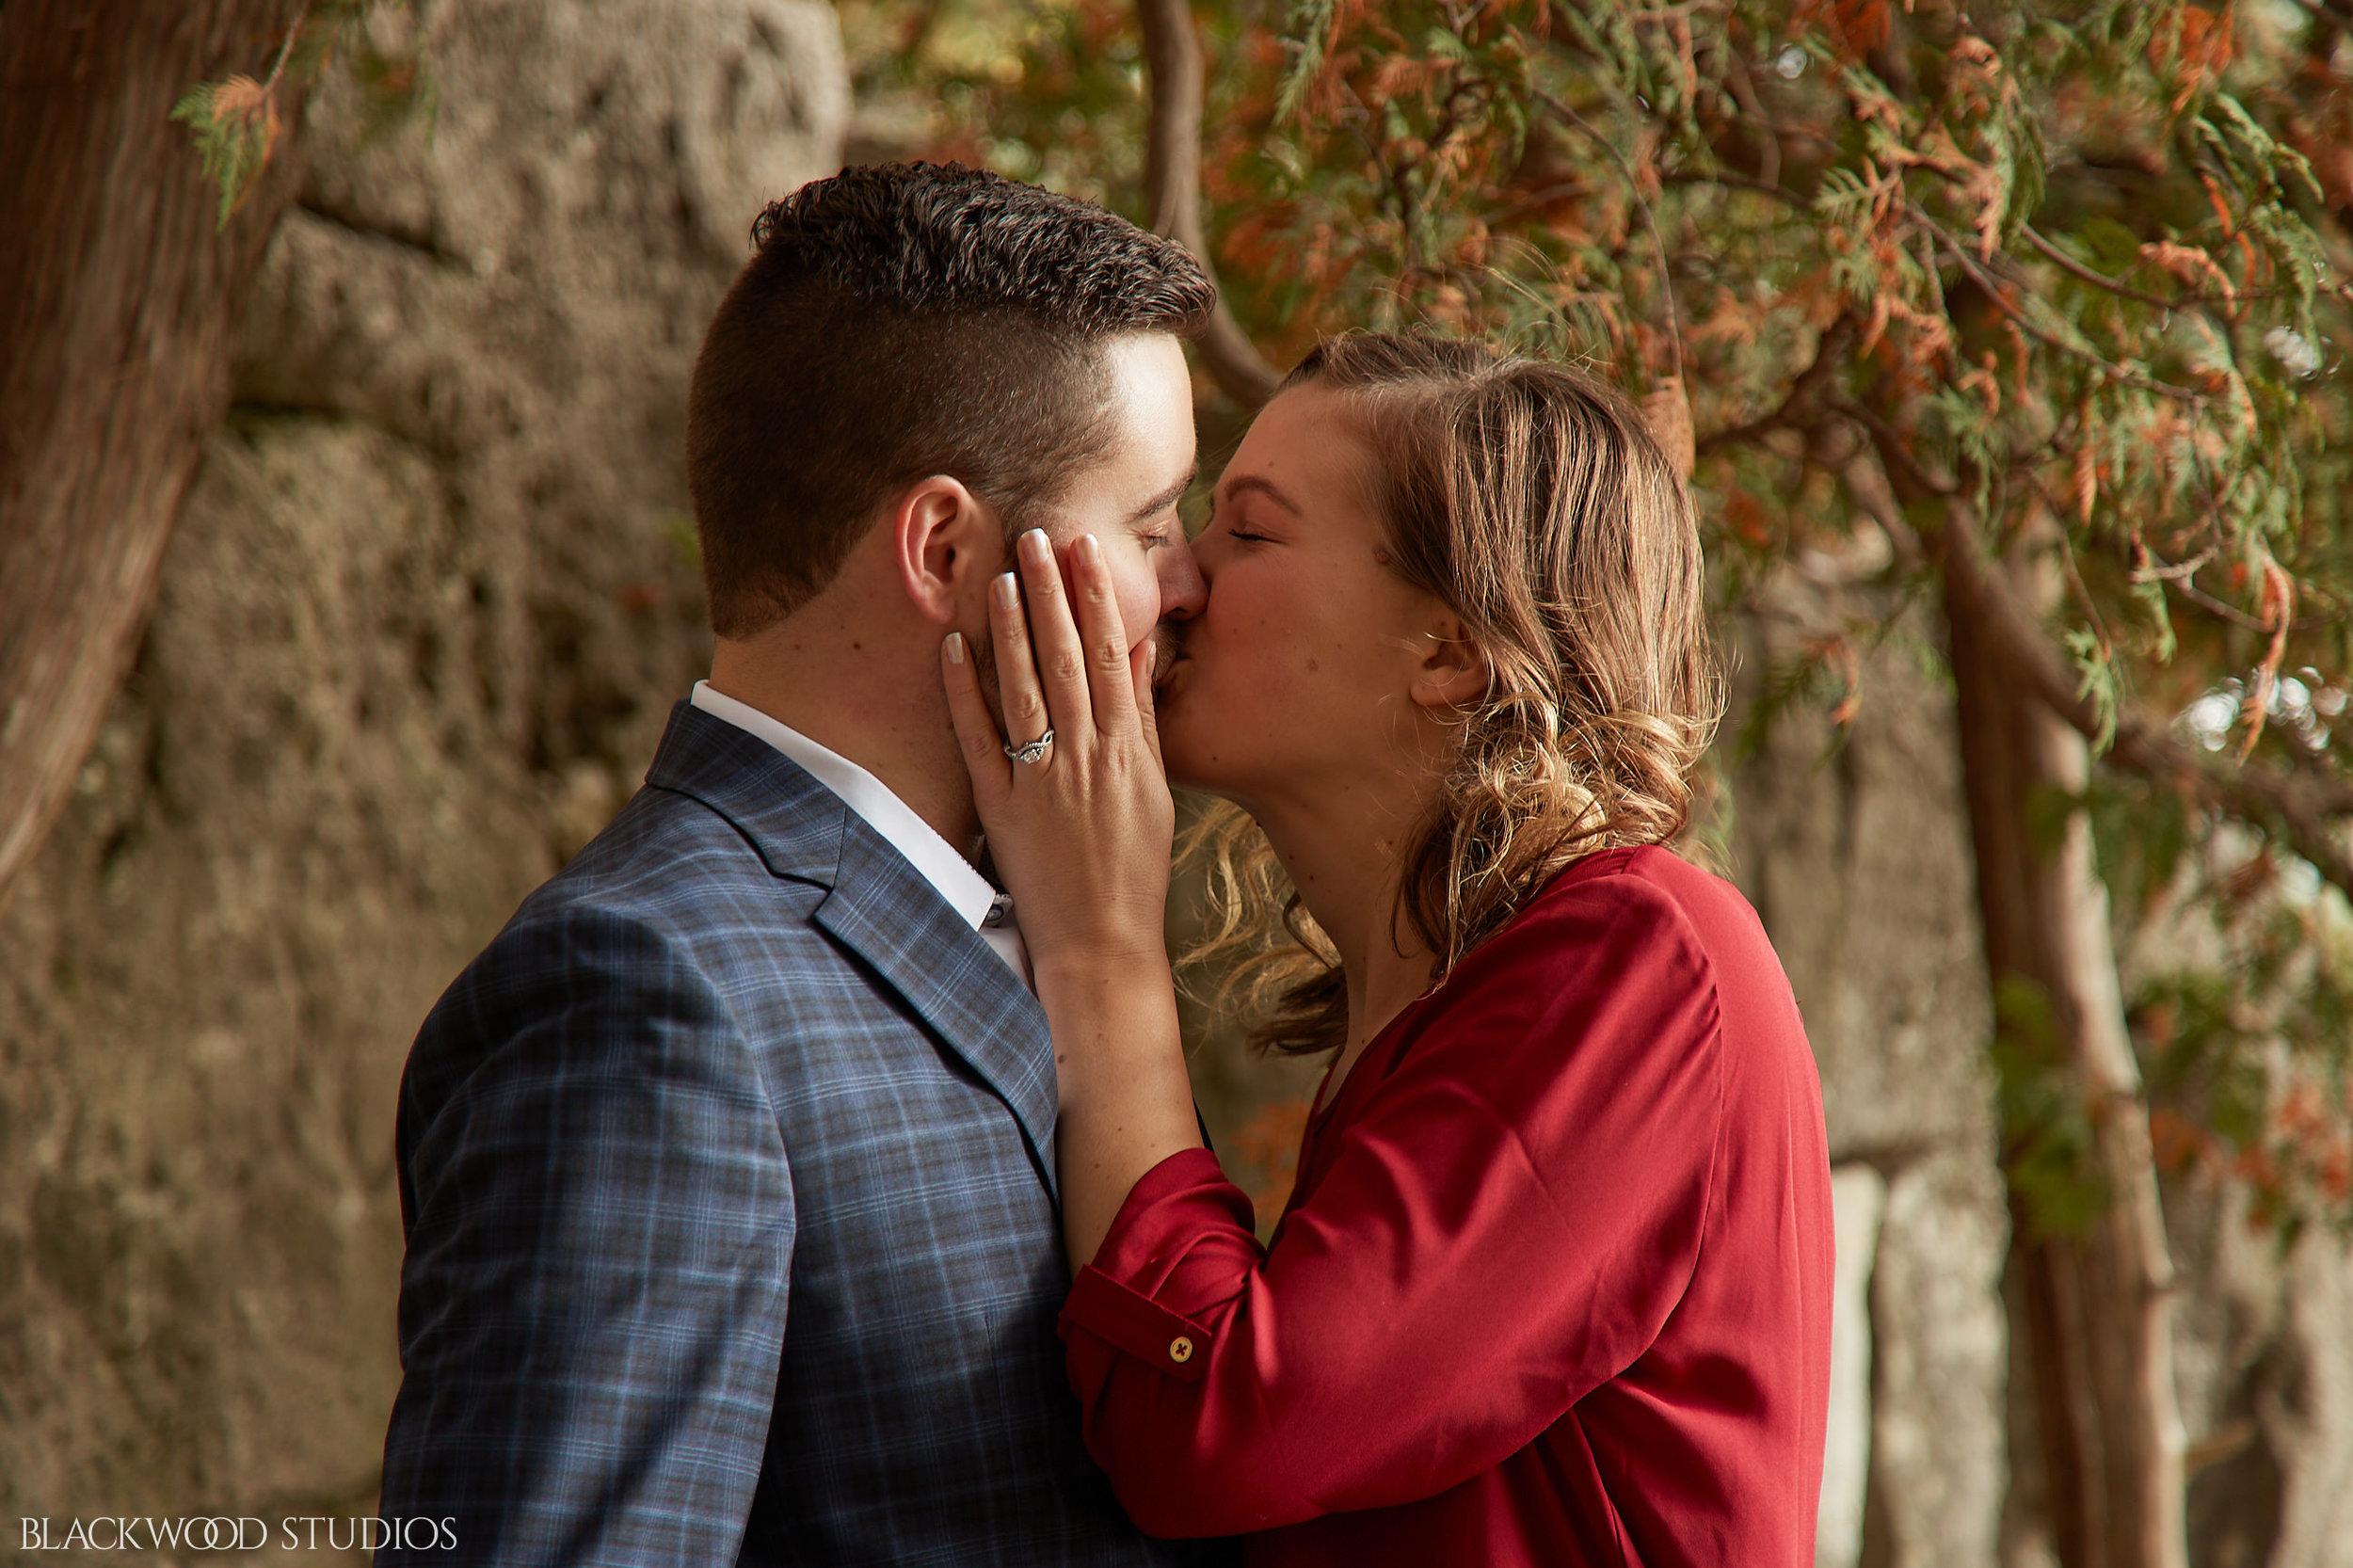 Blackwood-Studios-20181014-145800-Dave-and-Natalie-Engagement-0032-Rattlesnake-Point-Conservation-Area-Milton-Ontario.jpg